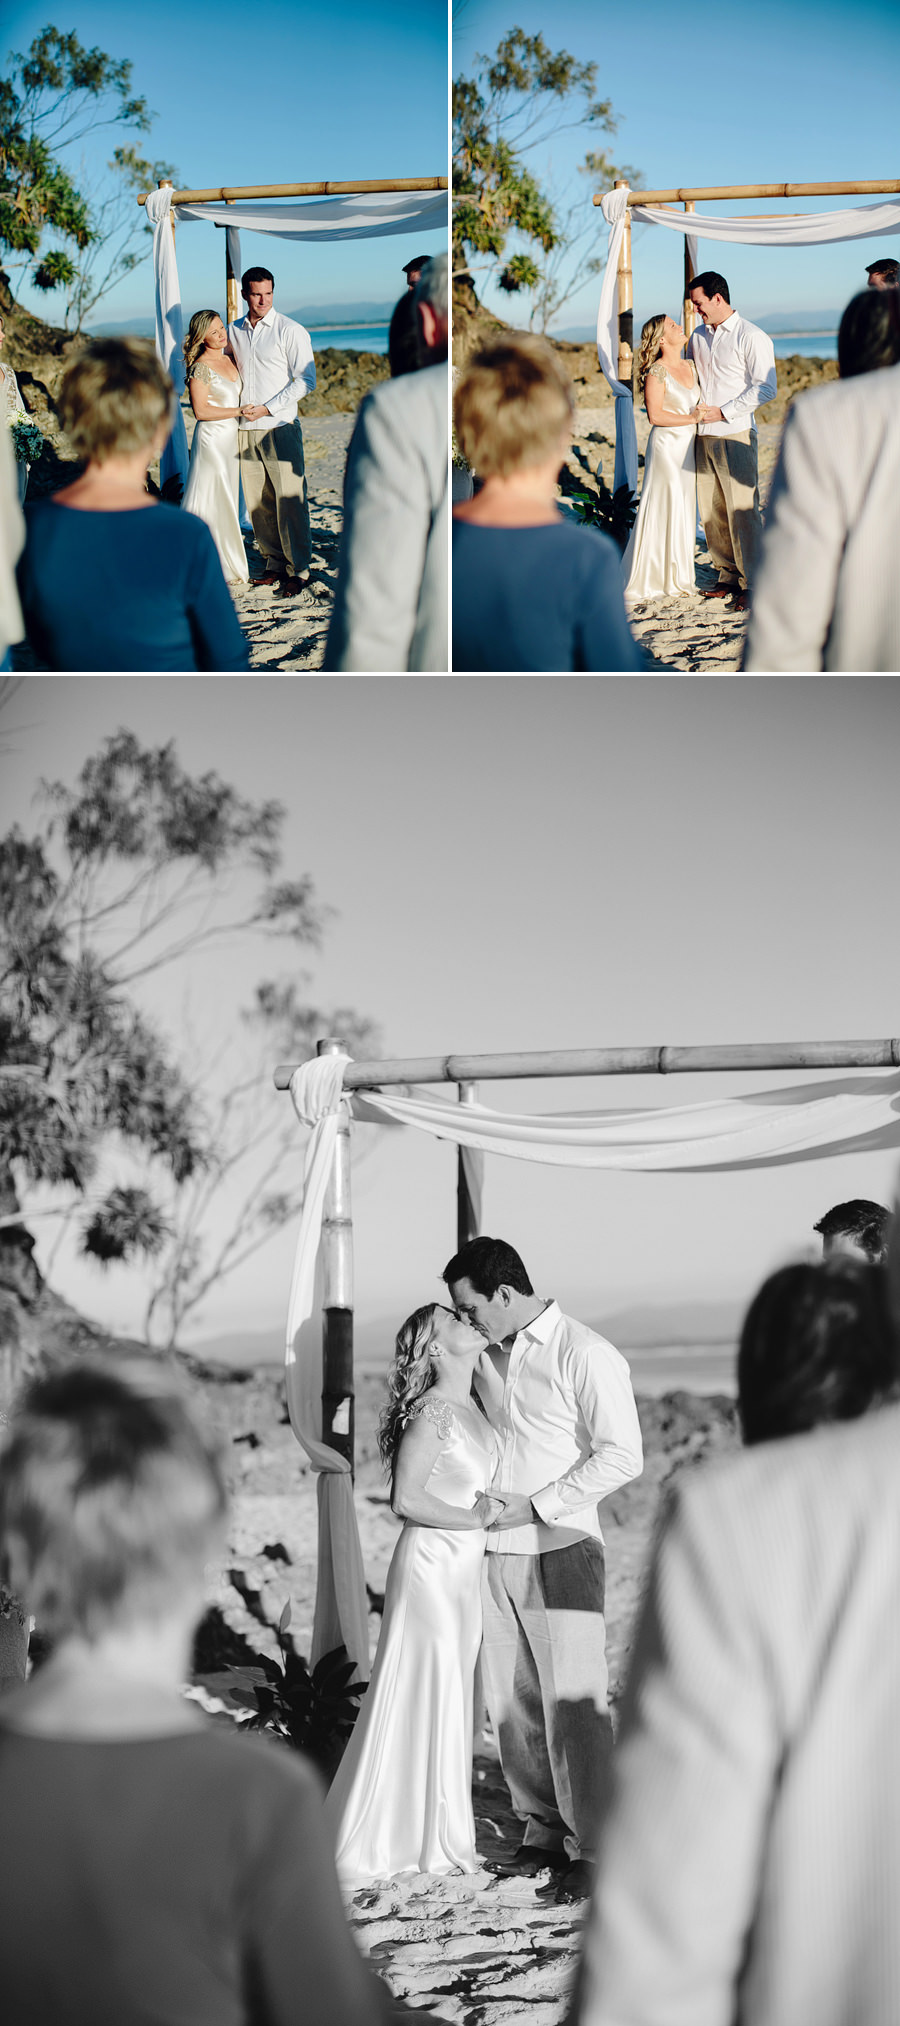 Beach Wedding Photographer: Kiss the bride